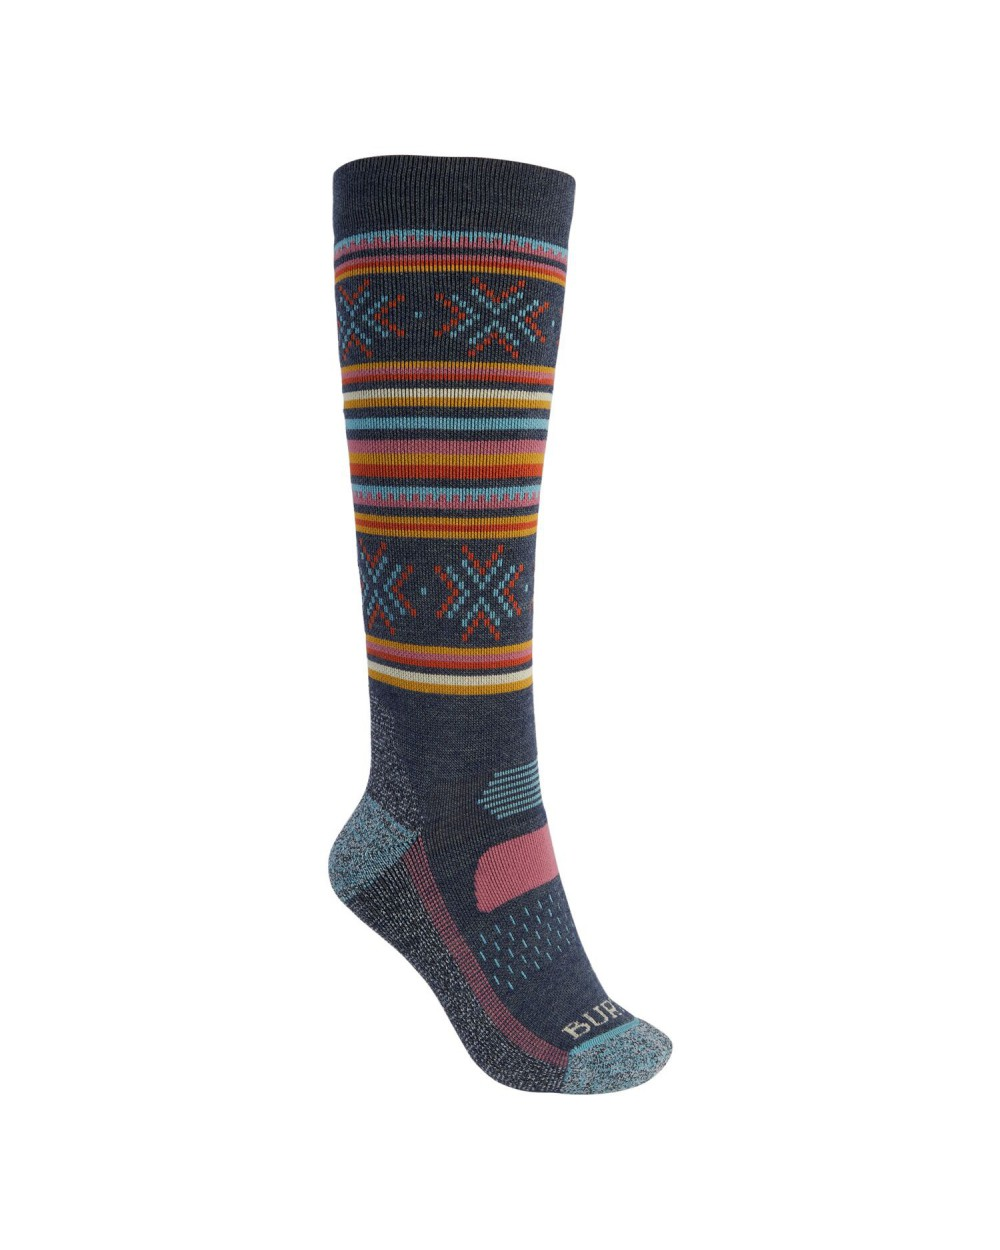 Burton Wms Performance Midweight Snowboard Socks - Dark Slate